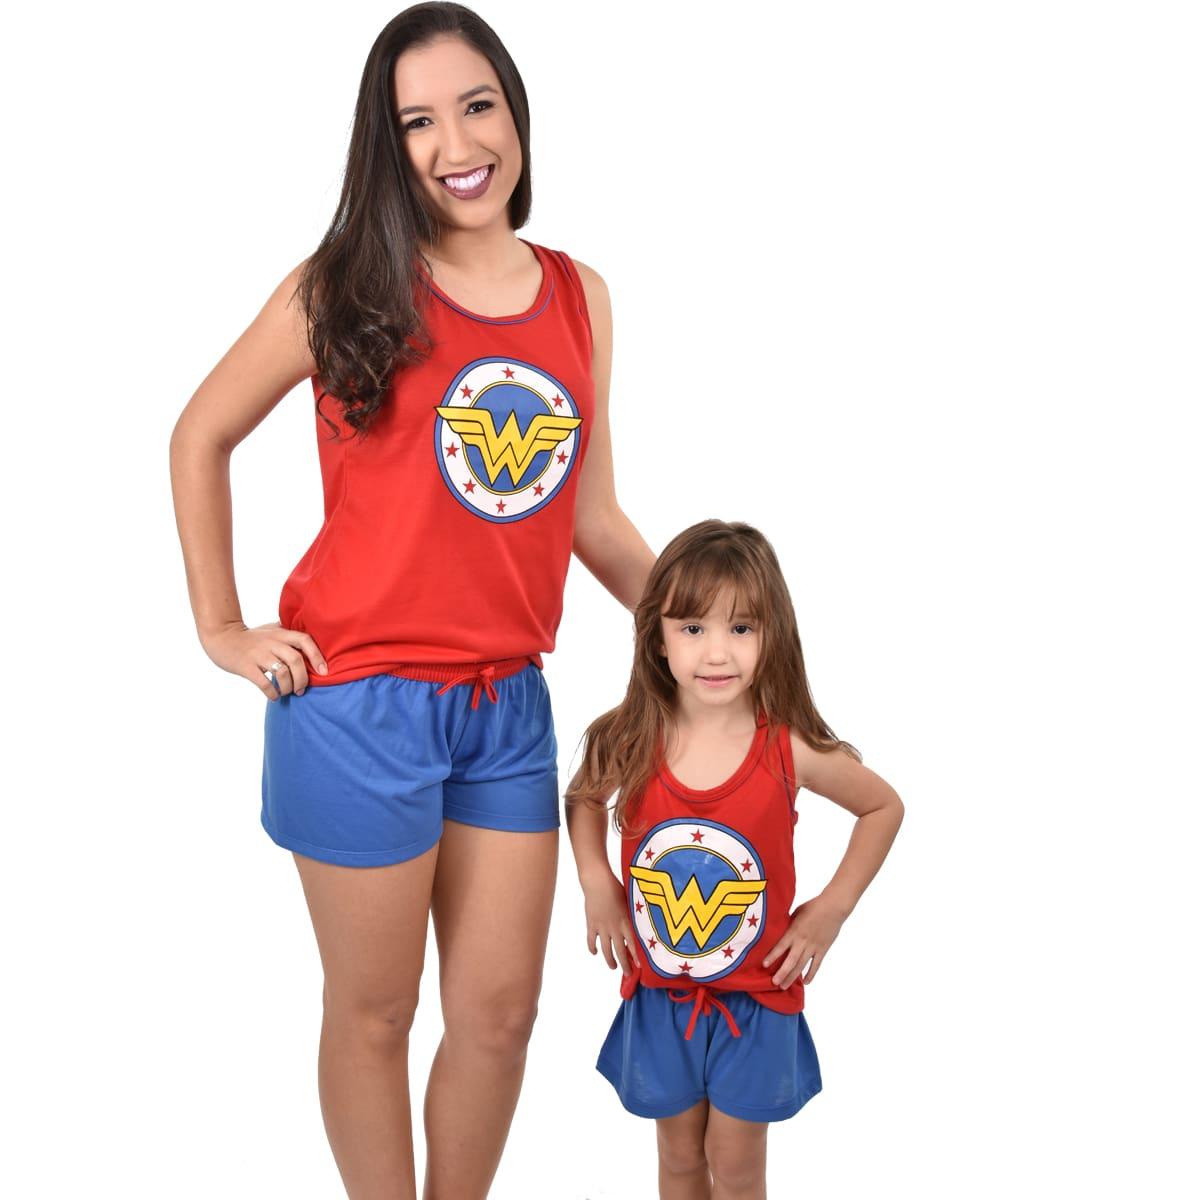 Baby Doll Short Doll Regata Mulher Maravilha Wonder Woman Feminino Adulto 328